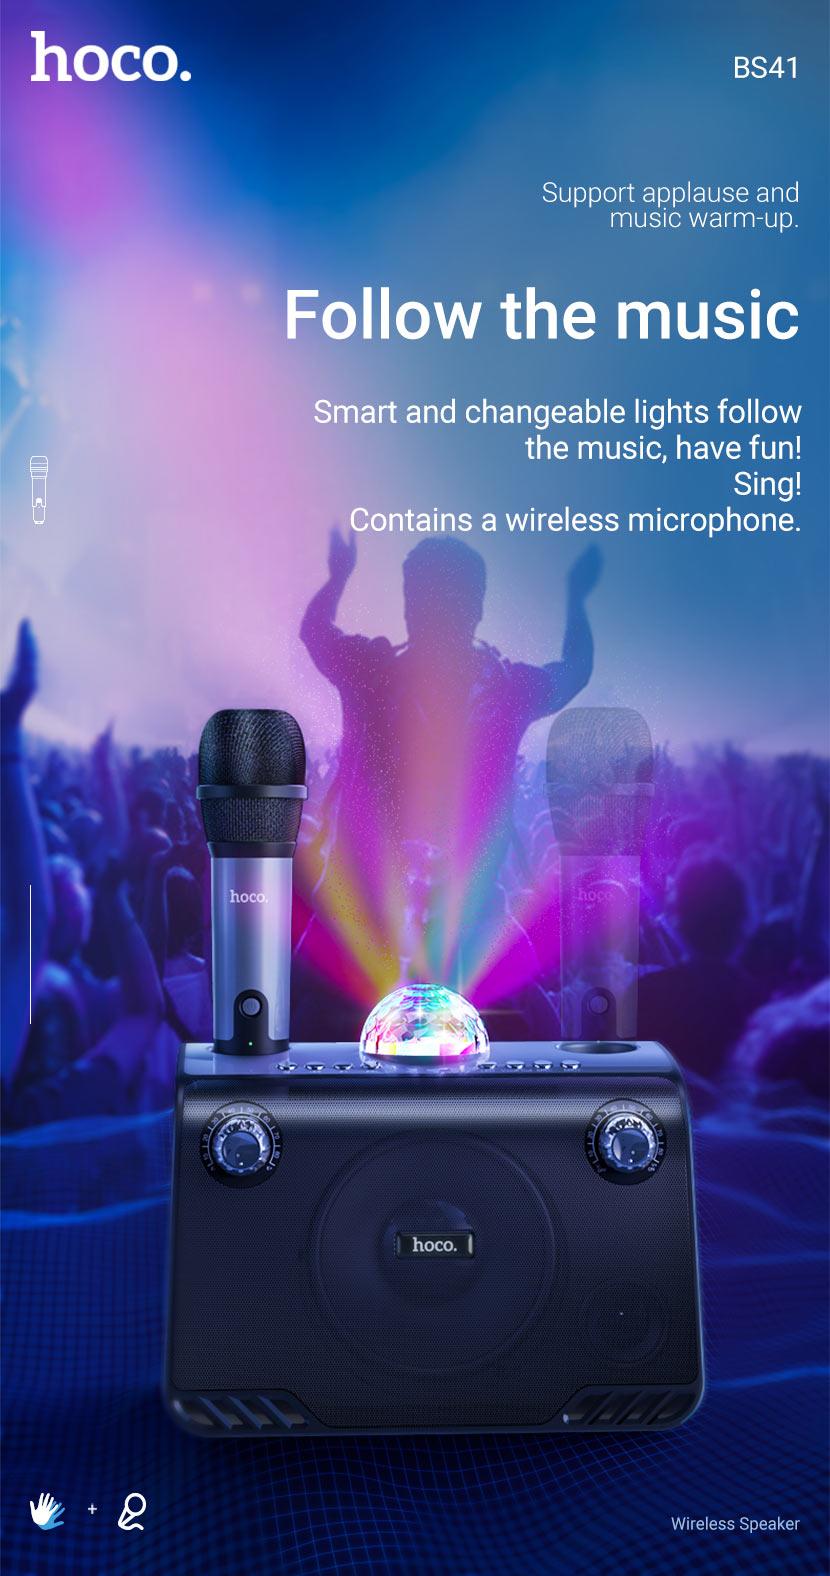 hoco news bs41 warm sound k song wireless speaker microphone en